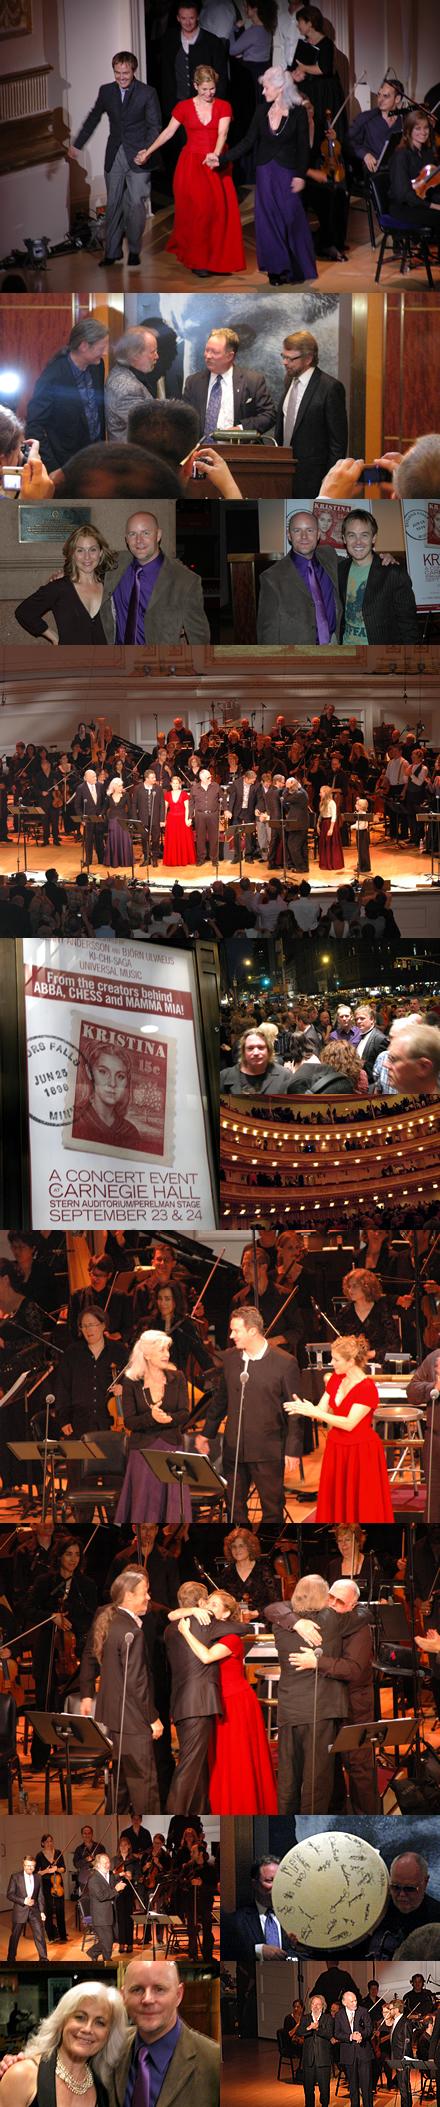 Memories of Kristina in Concert at Carnegie Hall